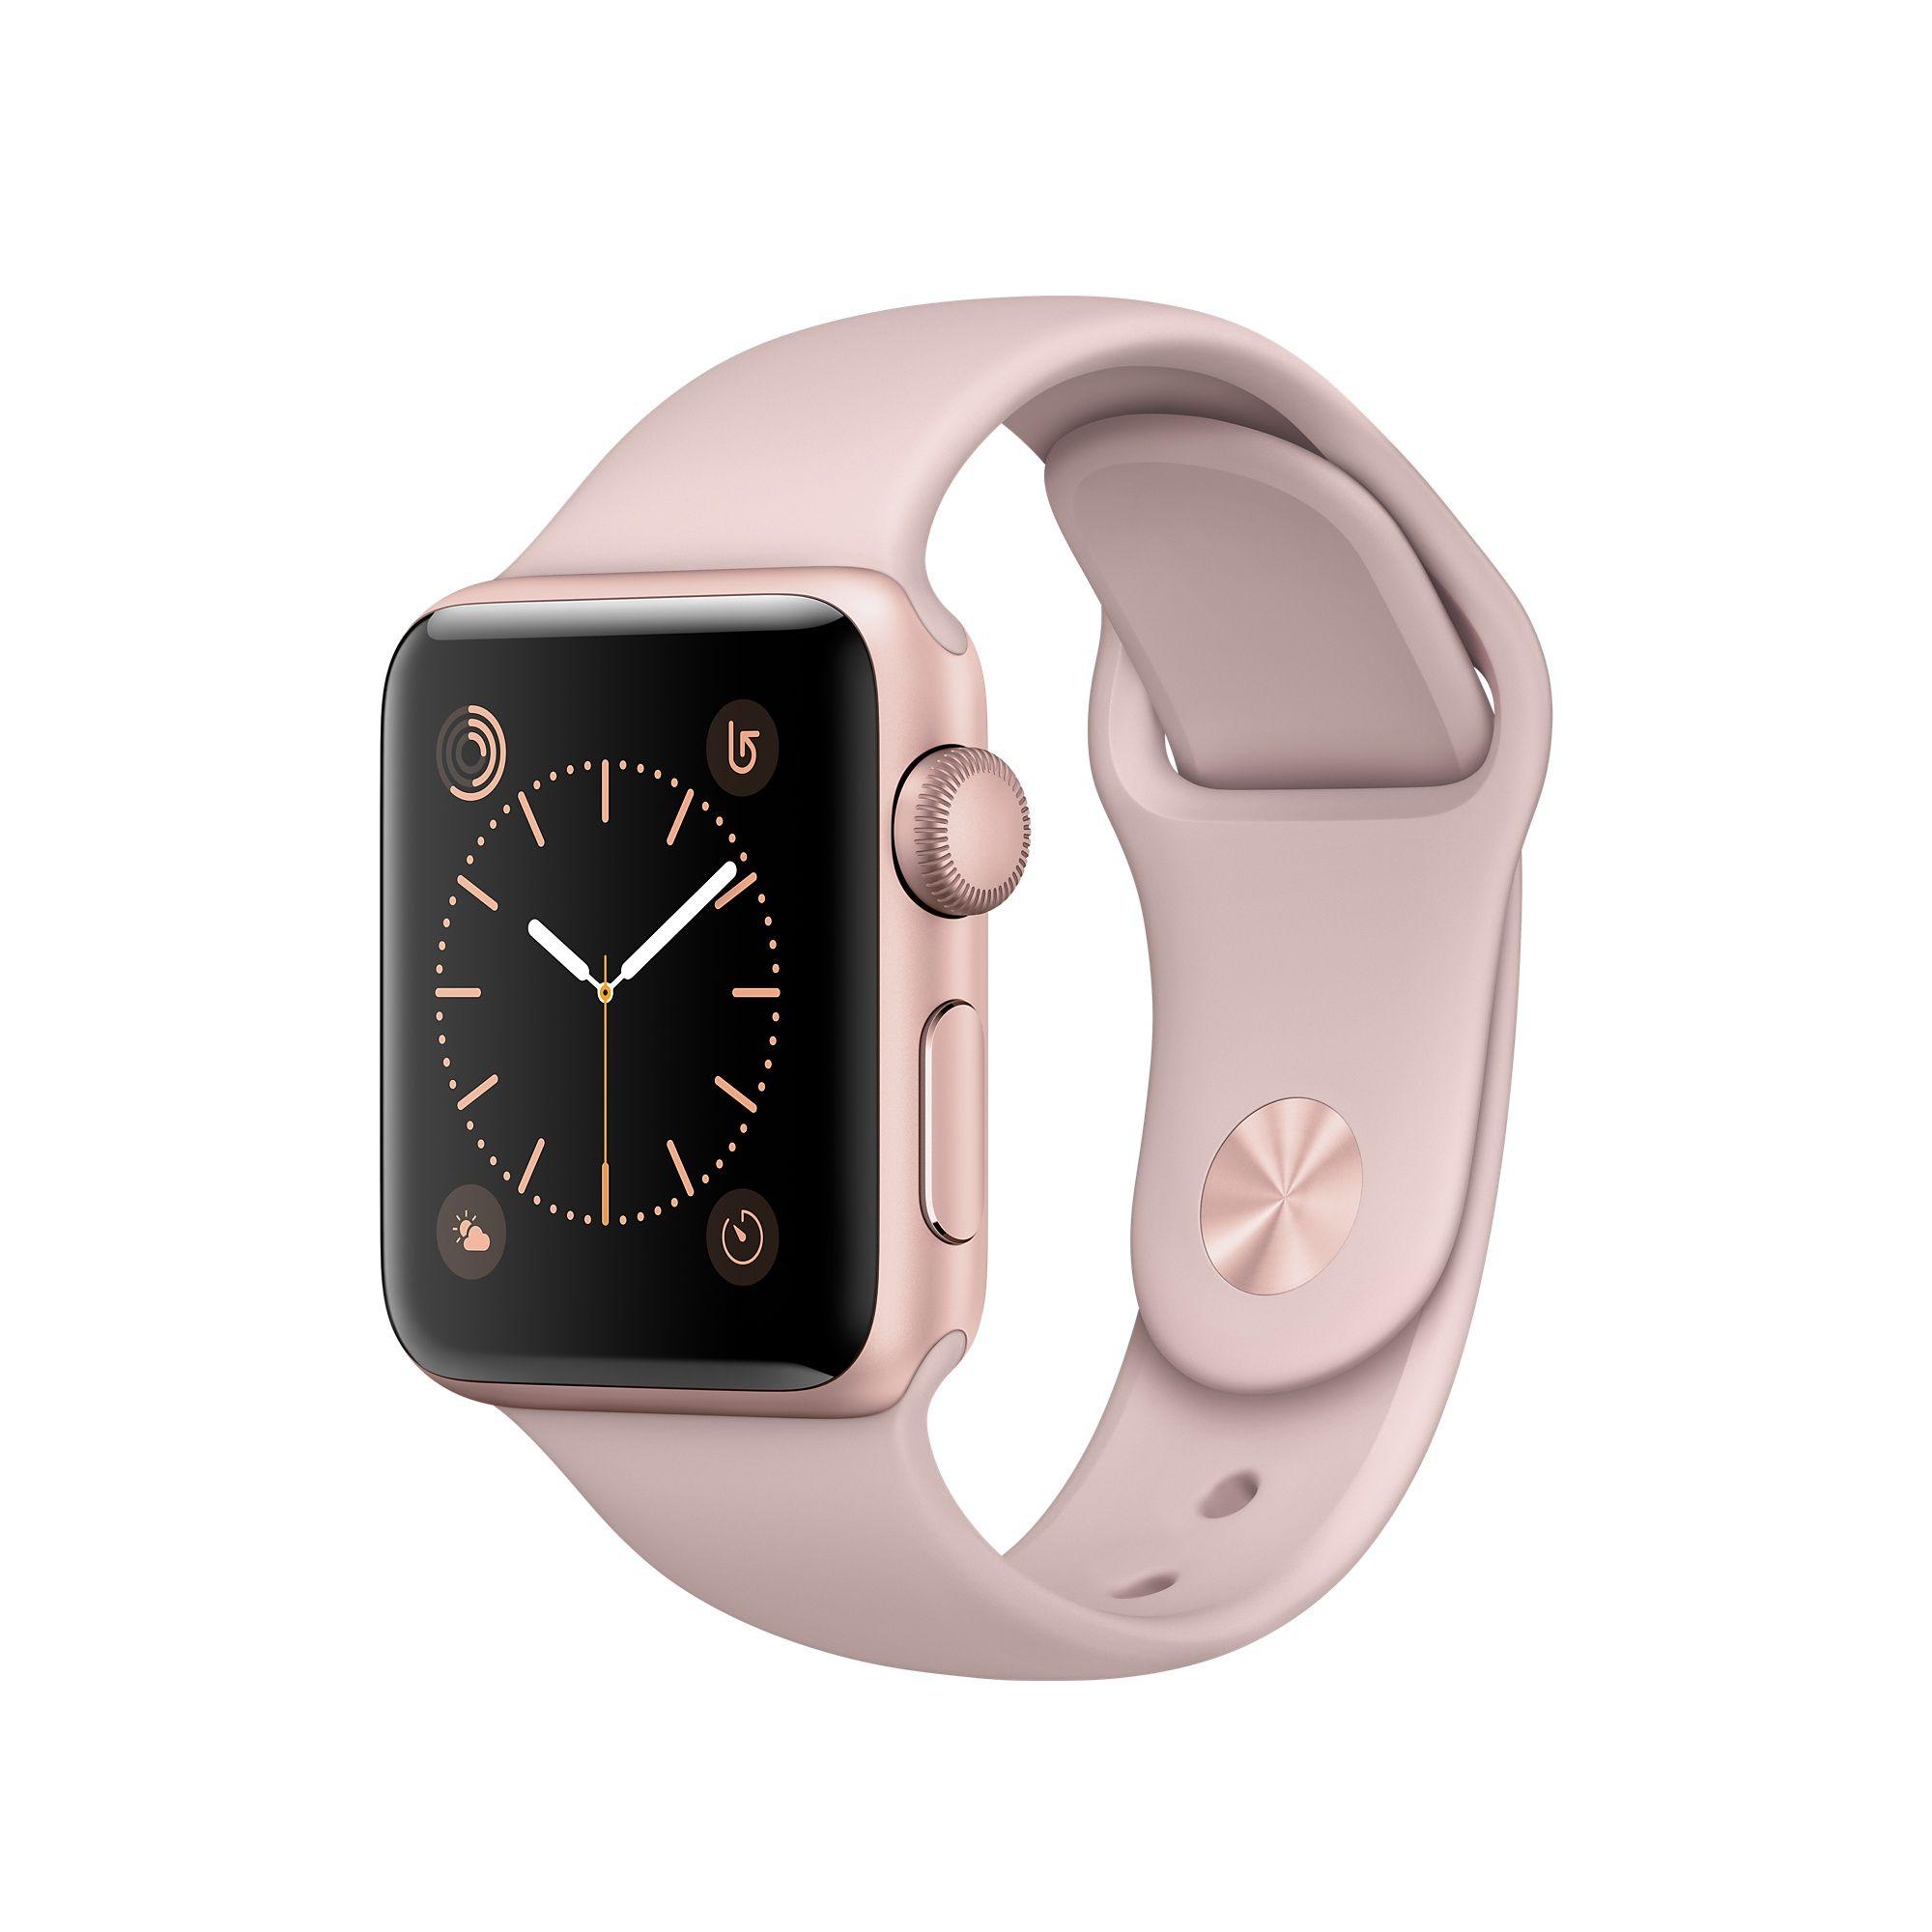 Apple Watch Series 5 Kaufen Rosa Relojes De Oro Apple Watch Correas Bandas De Reloj